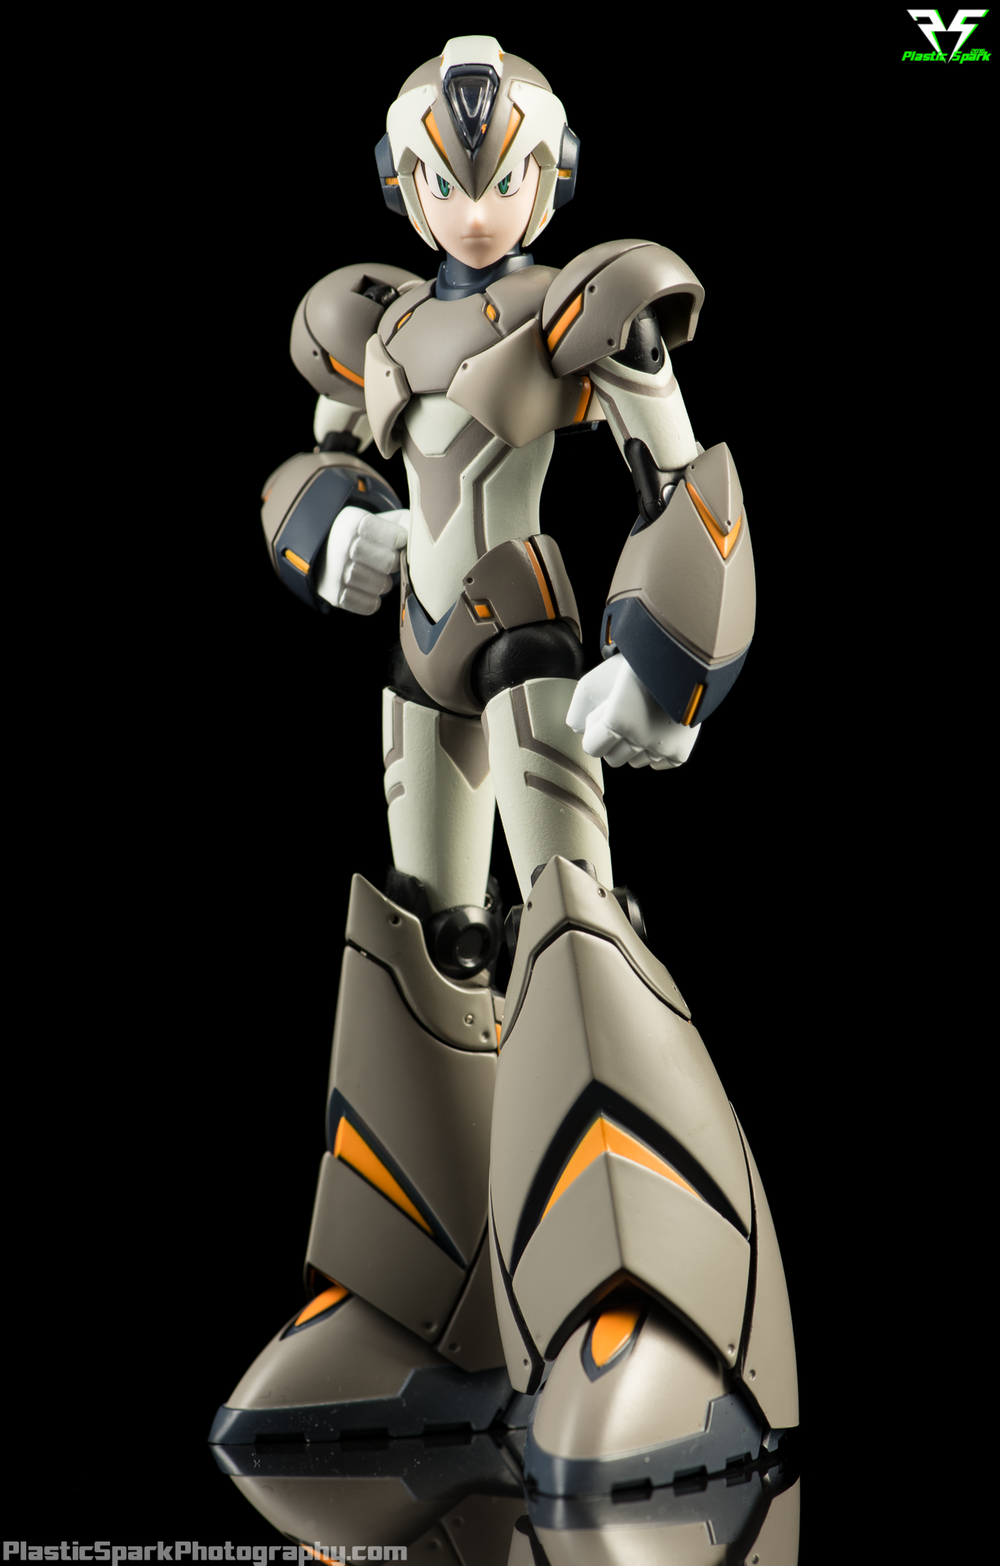 Truforce-Megaman-X-KS-Variant-(3-of-3).png